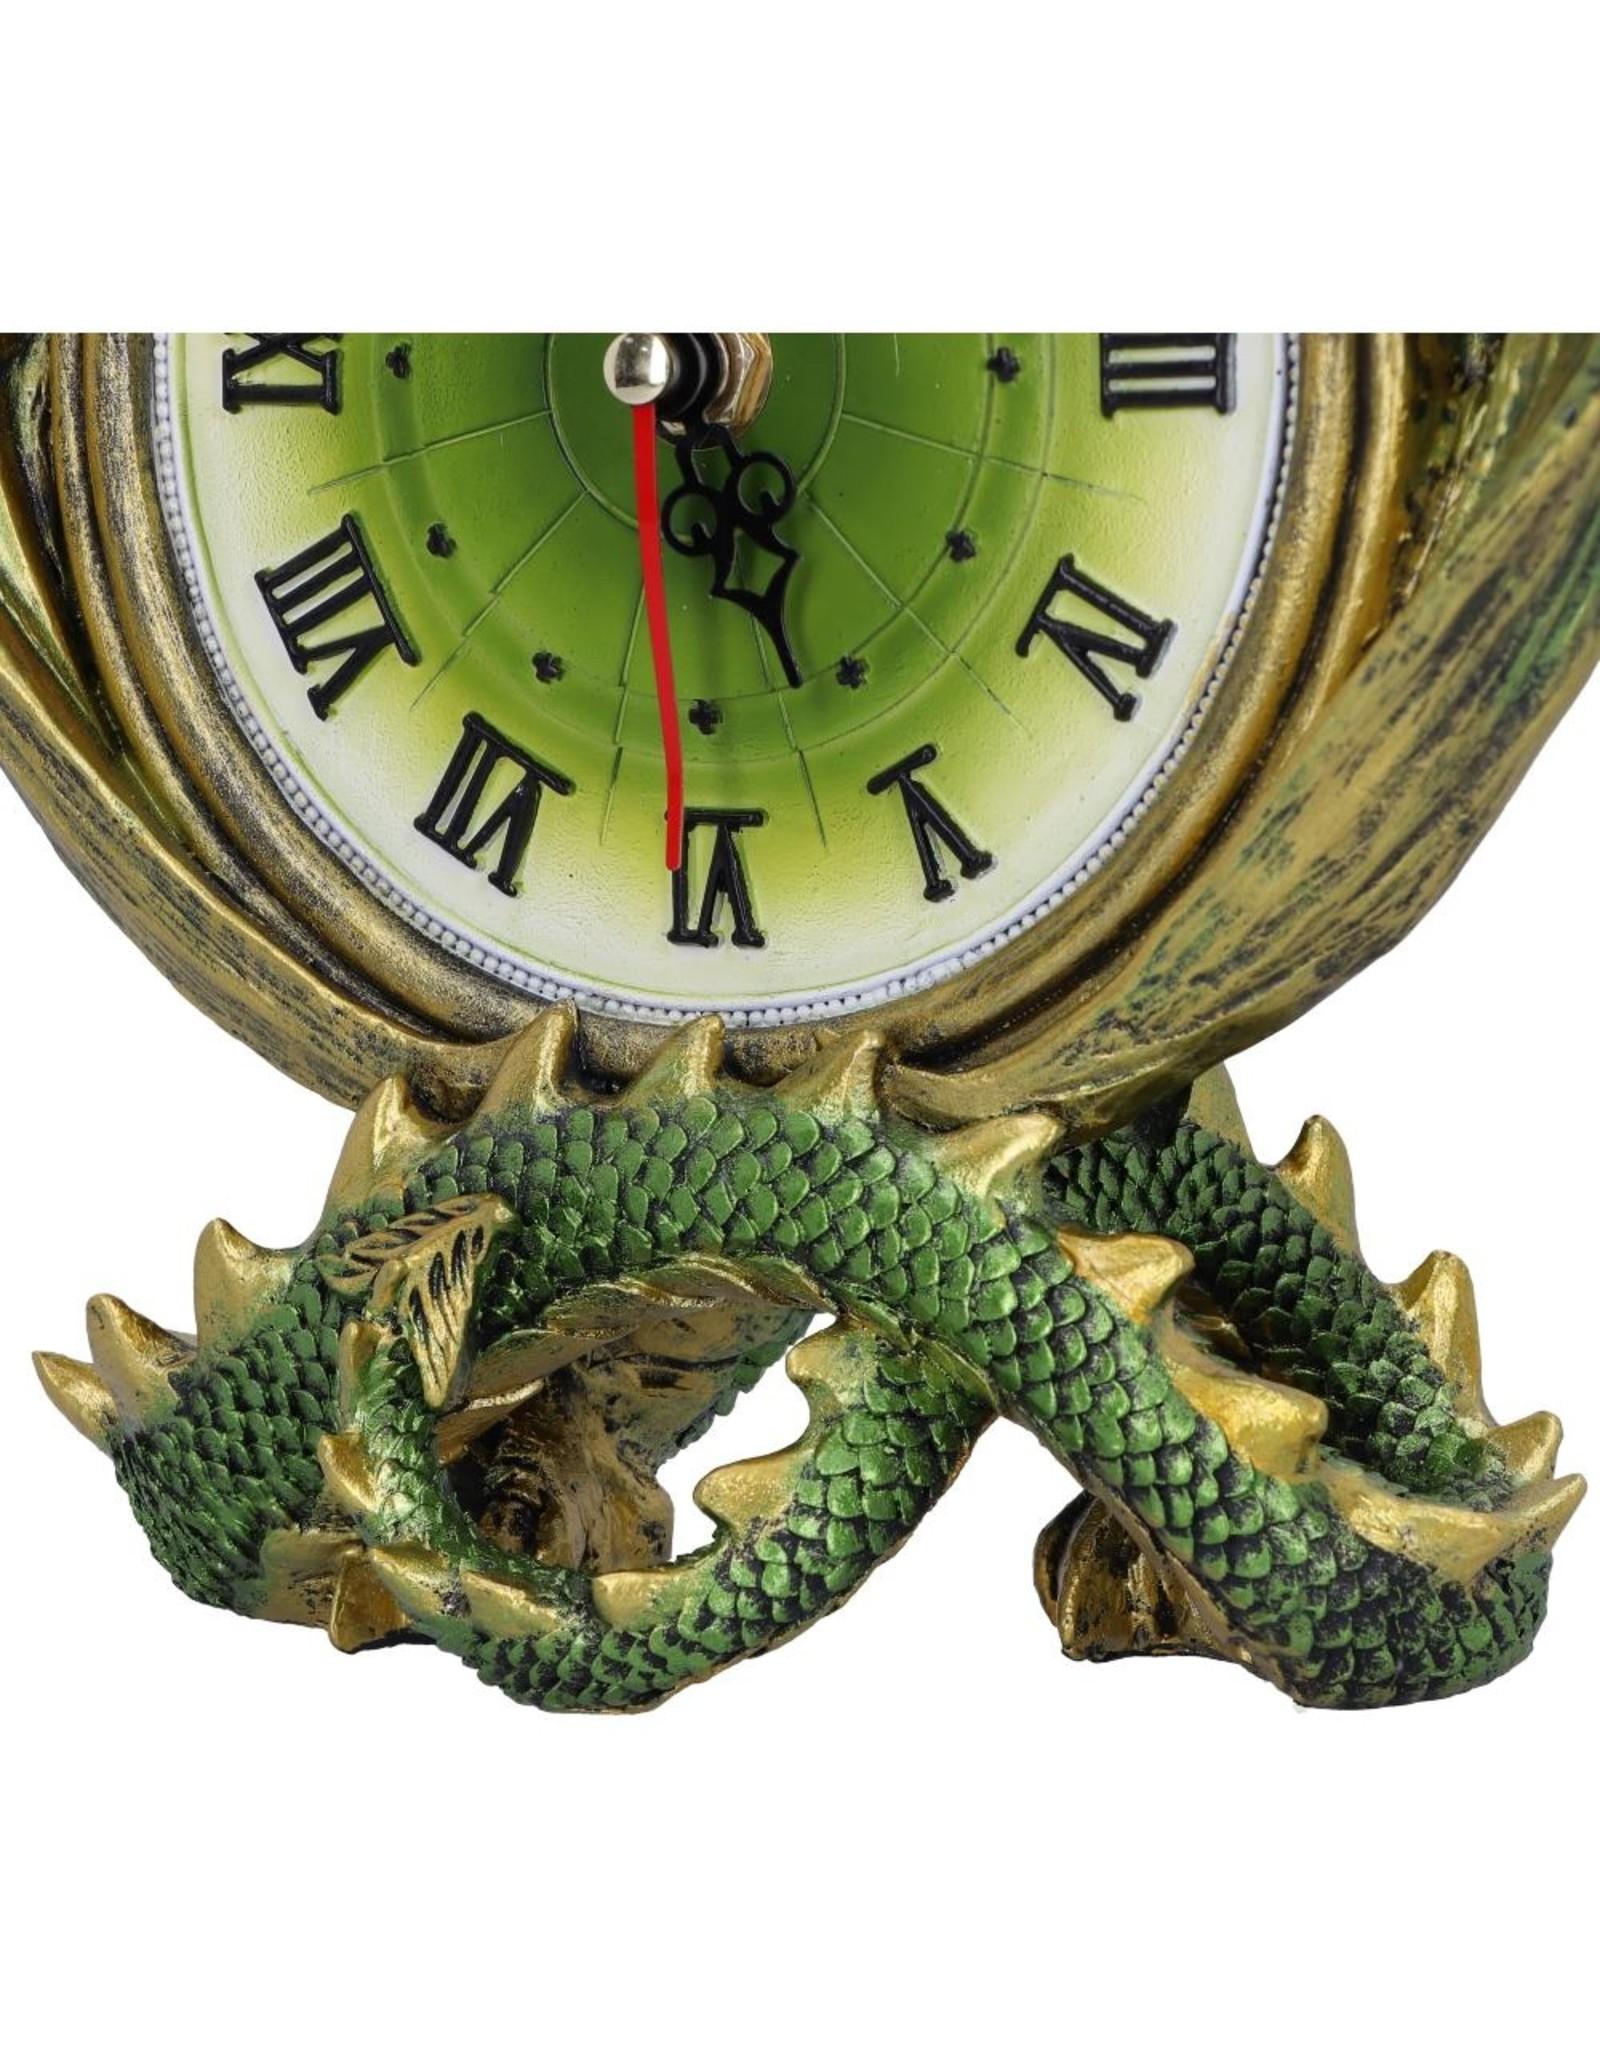 Nemesis Now Giftware Beelden Collectables  - Emerald Chronology draken klok